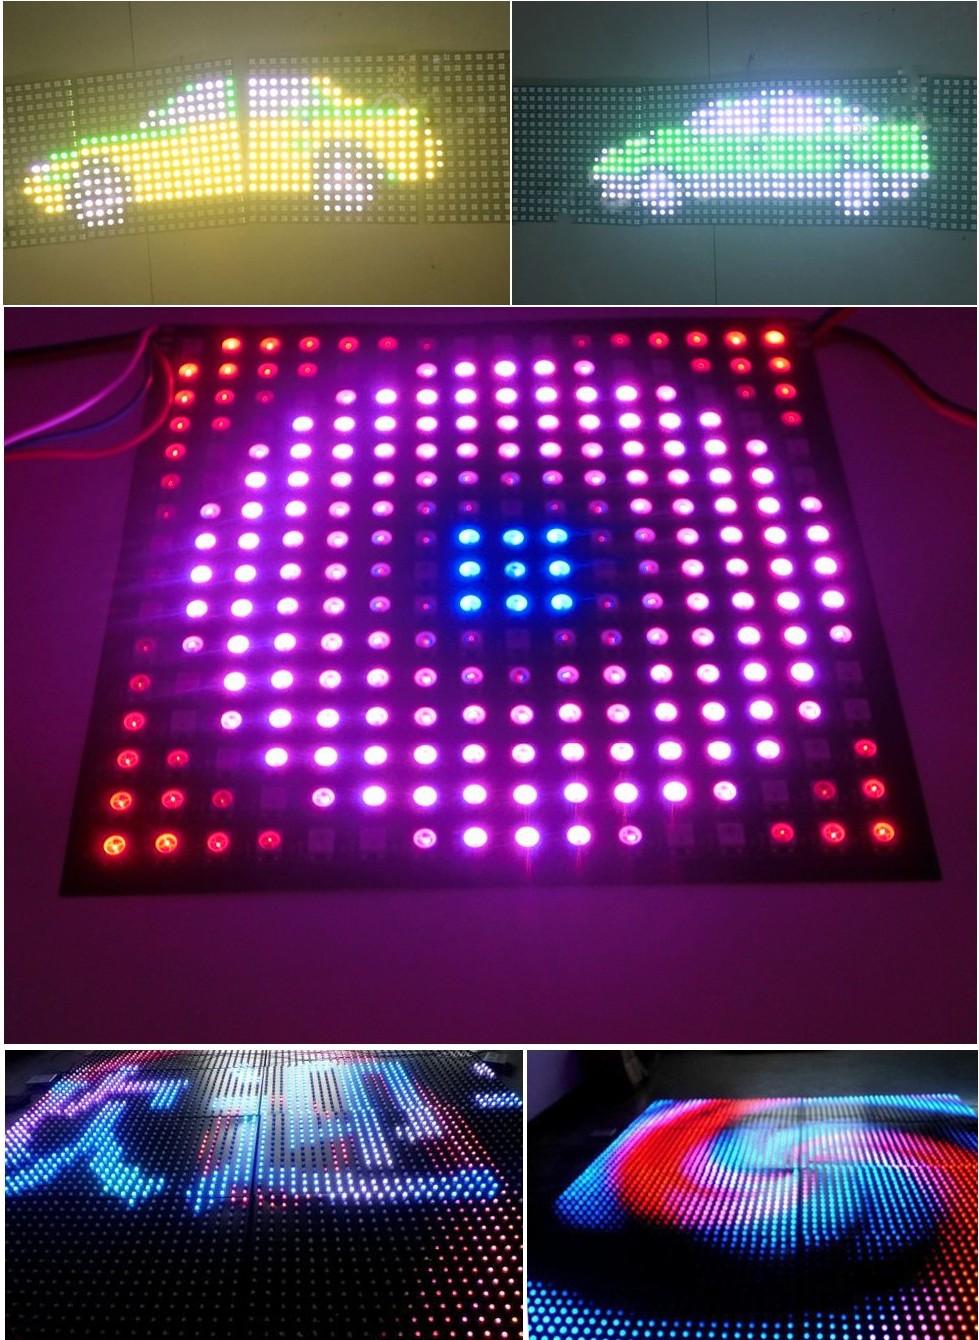 8cm_8cm_64_LEDs_WS2812B_Rigid_Digital_5